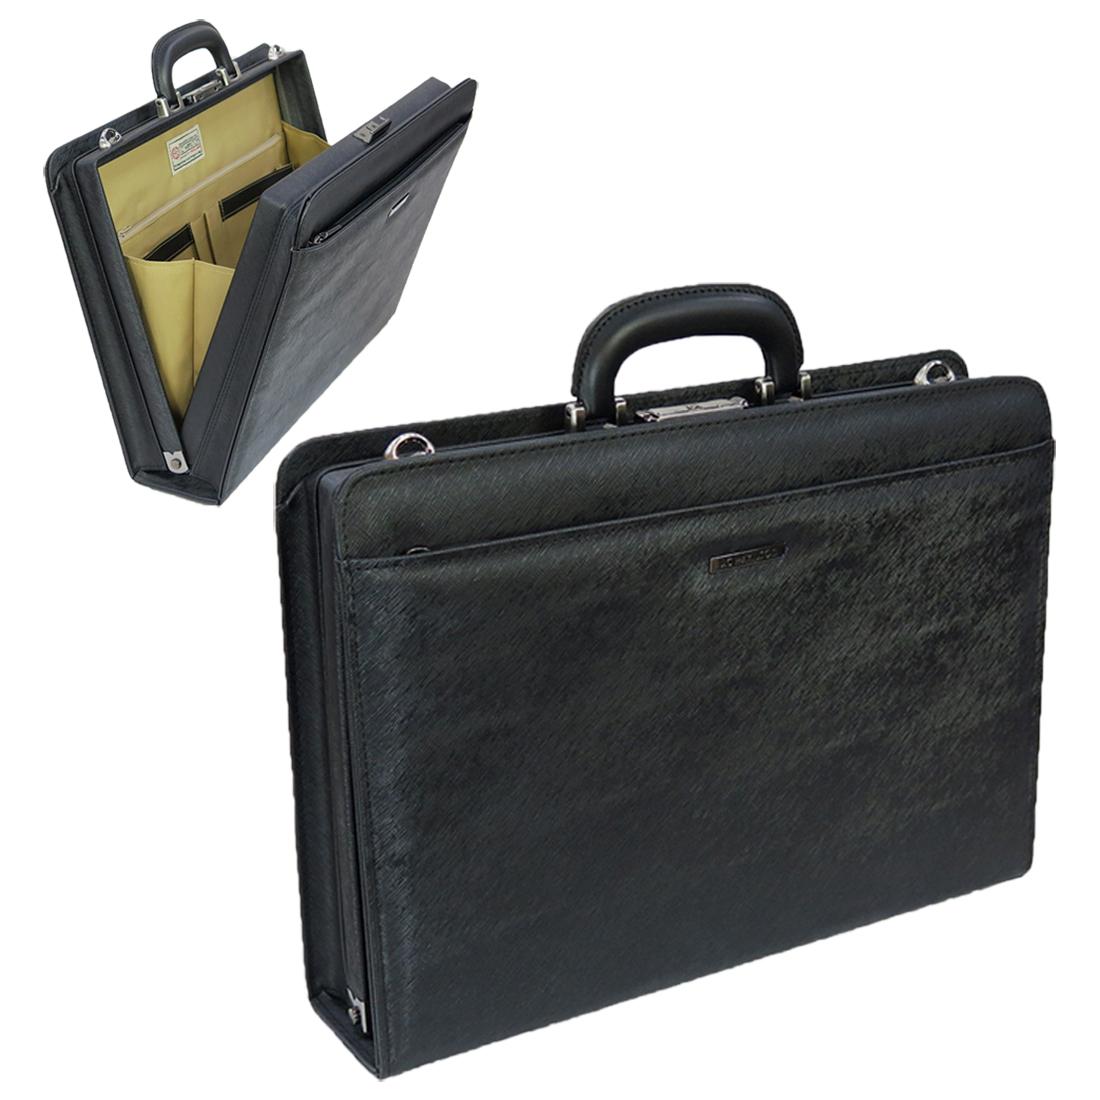 J.C HAMILTON(ハミルトン)ダレス型ビジネスバッグ 22325 口枠型 キーロック付 ブリーフ 通勤 書類入れ 日本製 メンズバッグ ブラック